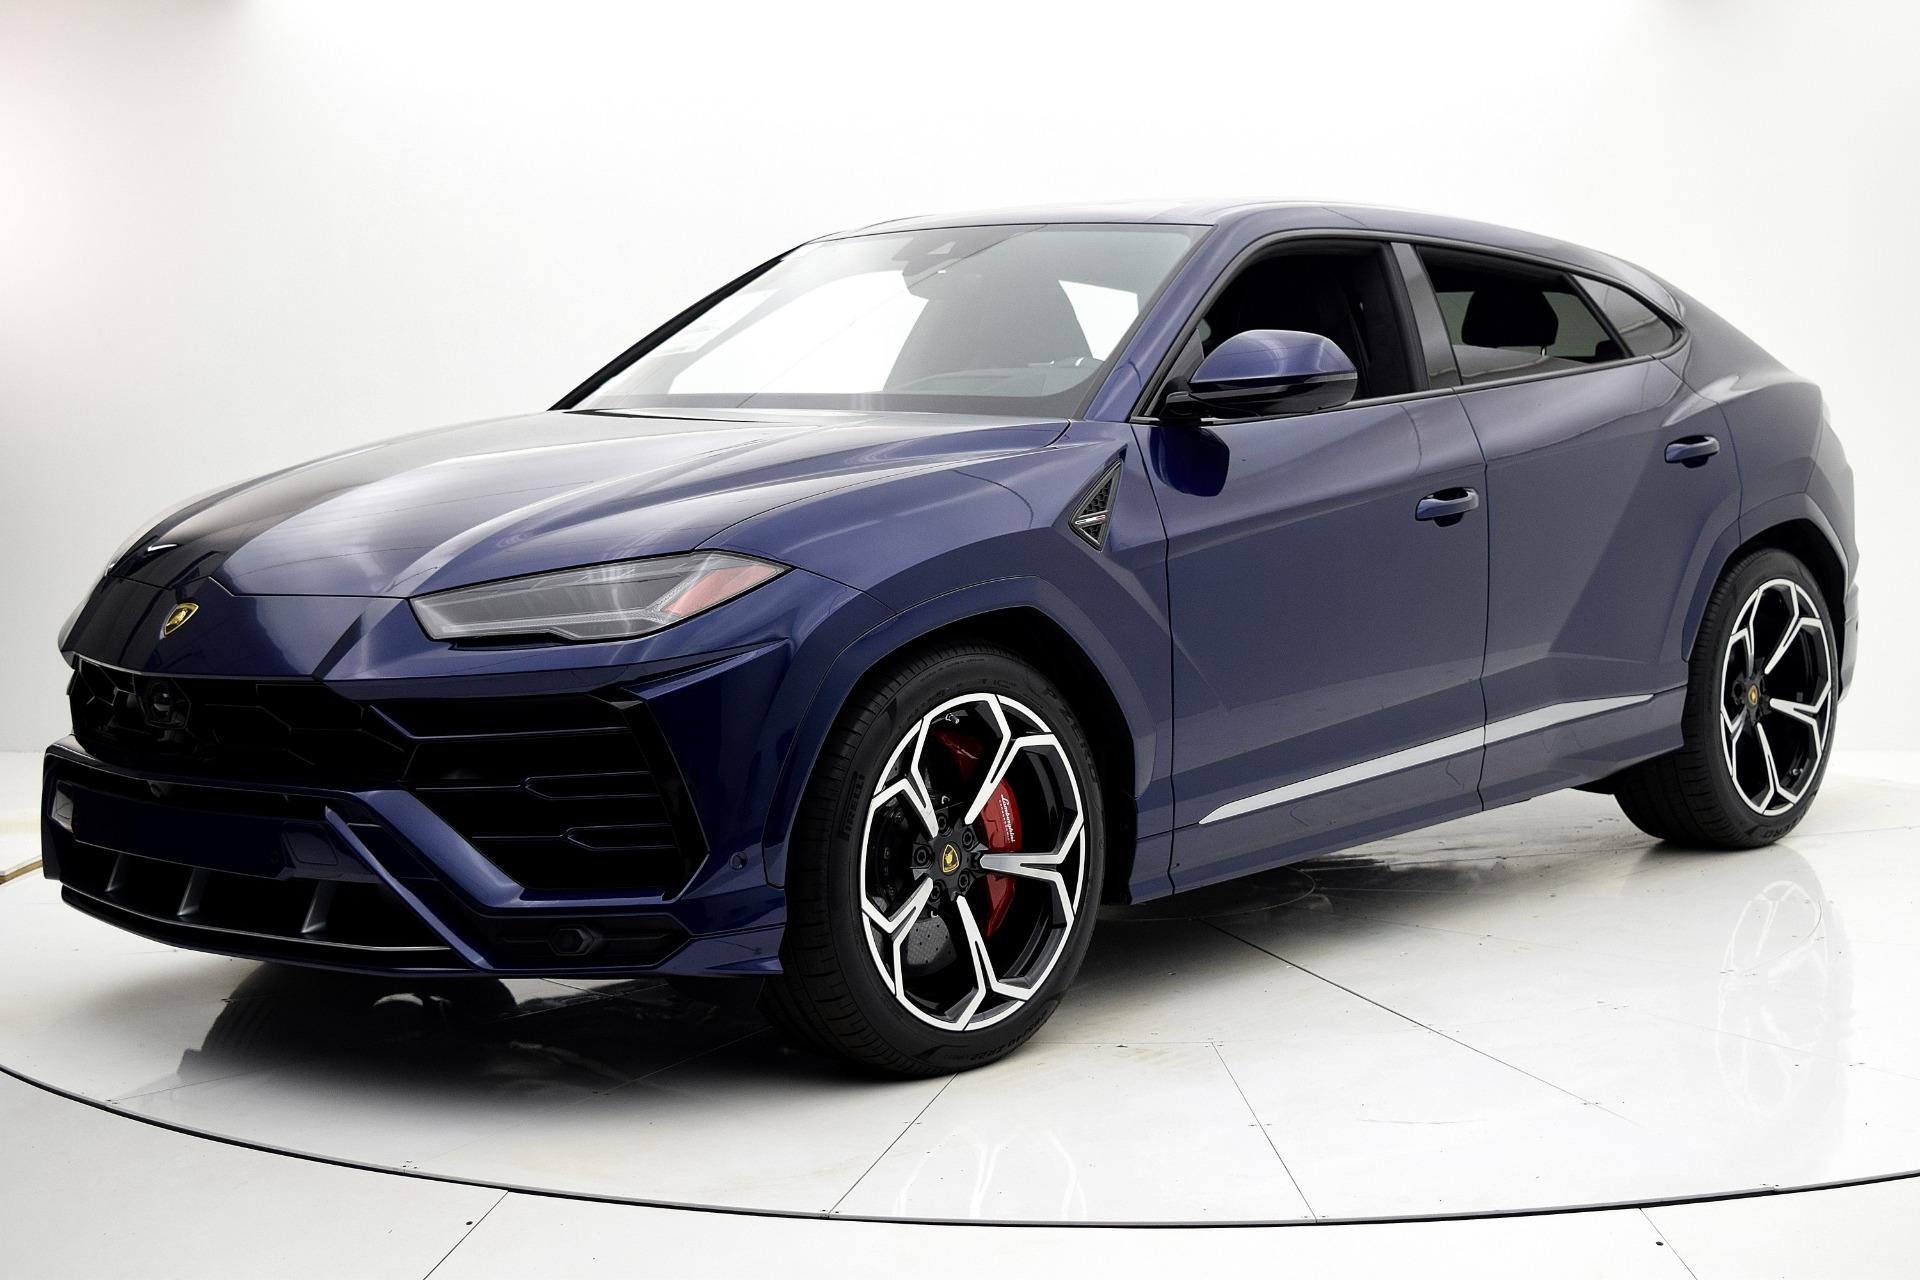 Used 2019 Lamborghini Urus for sale $245,880 at Bentley Palmyra N.J. in Palmyra NJ 08065 2